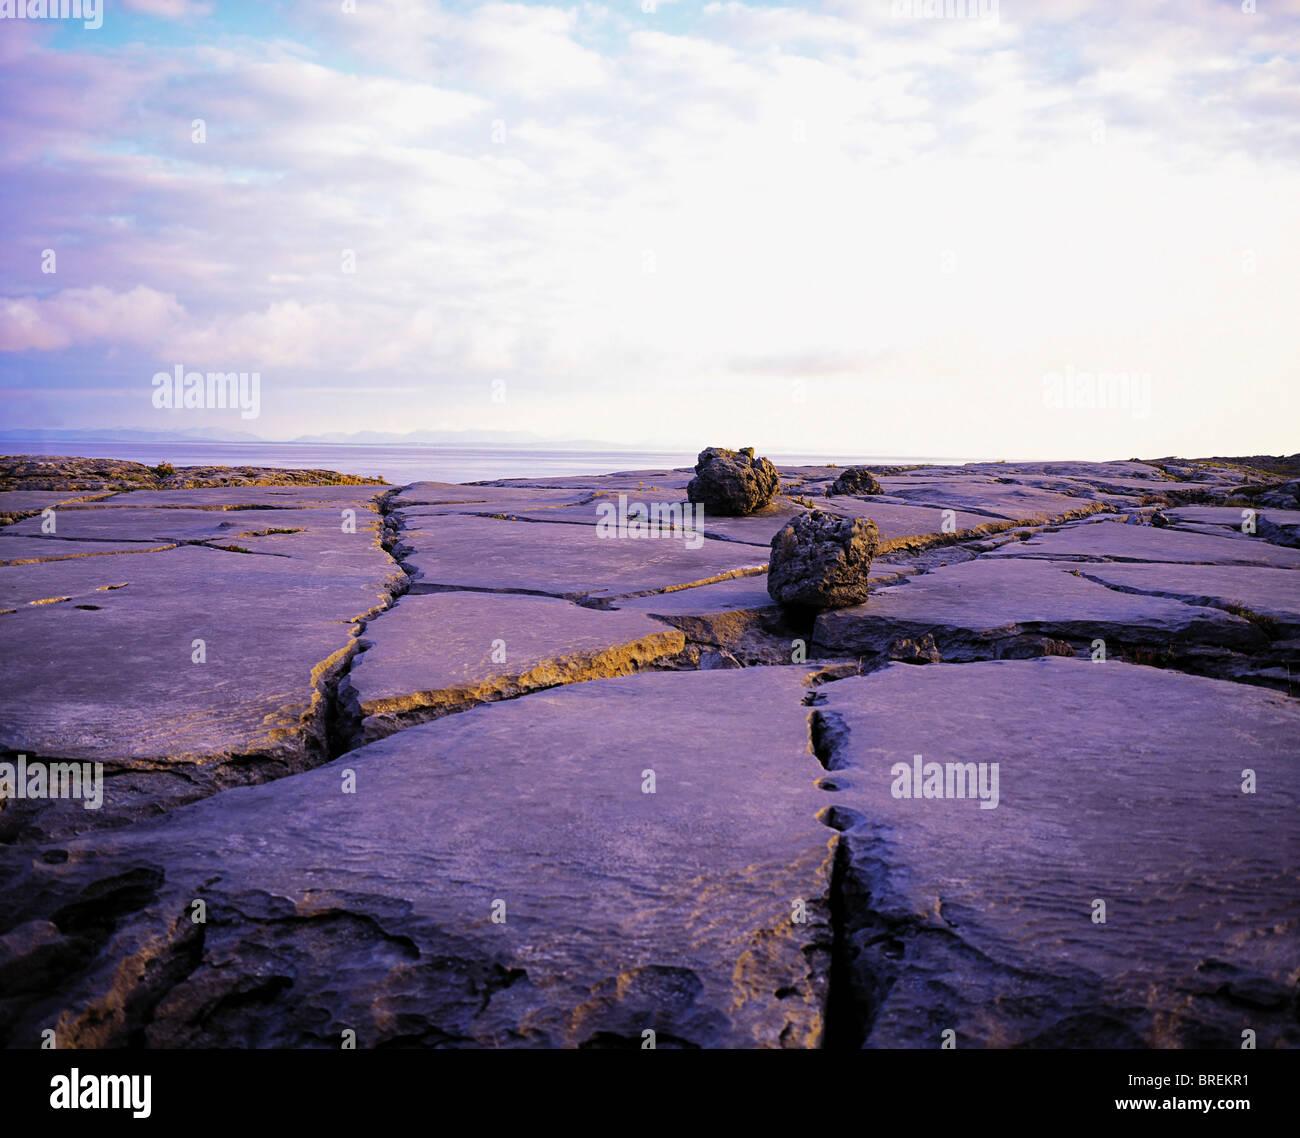 Der Burren, Co. Clare, Irland, Karstlandschaft Region, Findlinge Stockbild